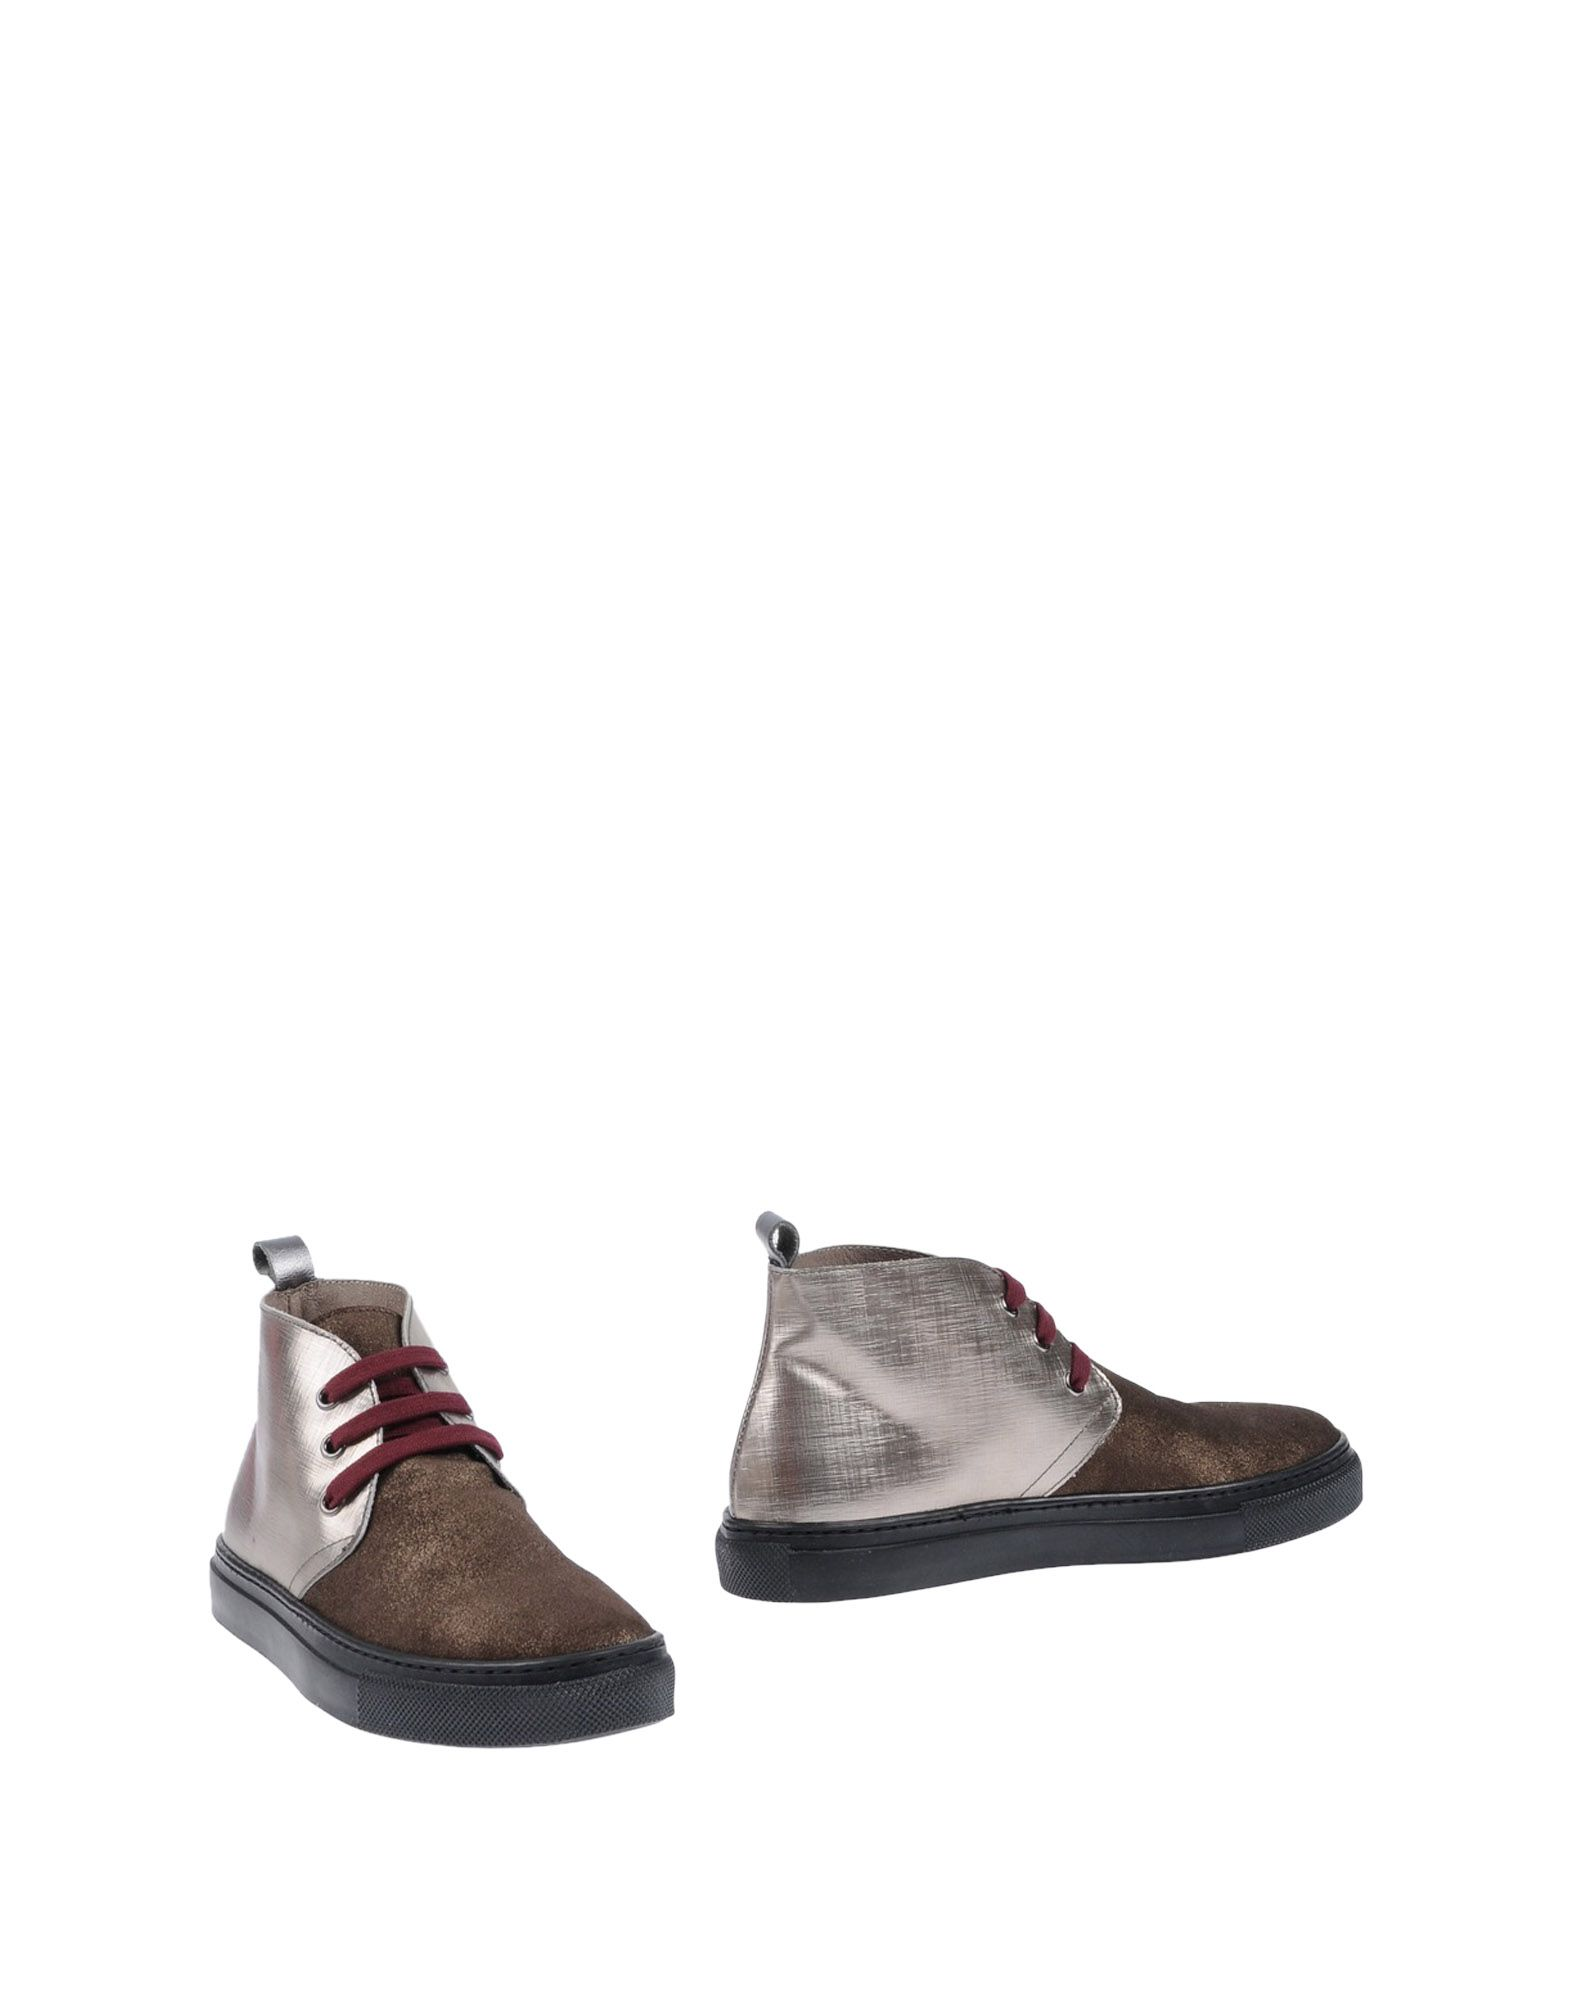 Ebarrito Stiefelette Damen  11457289LB Gute Qualität beliebte Schuhe